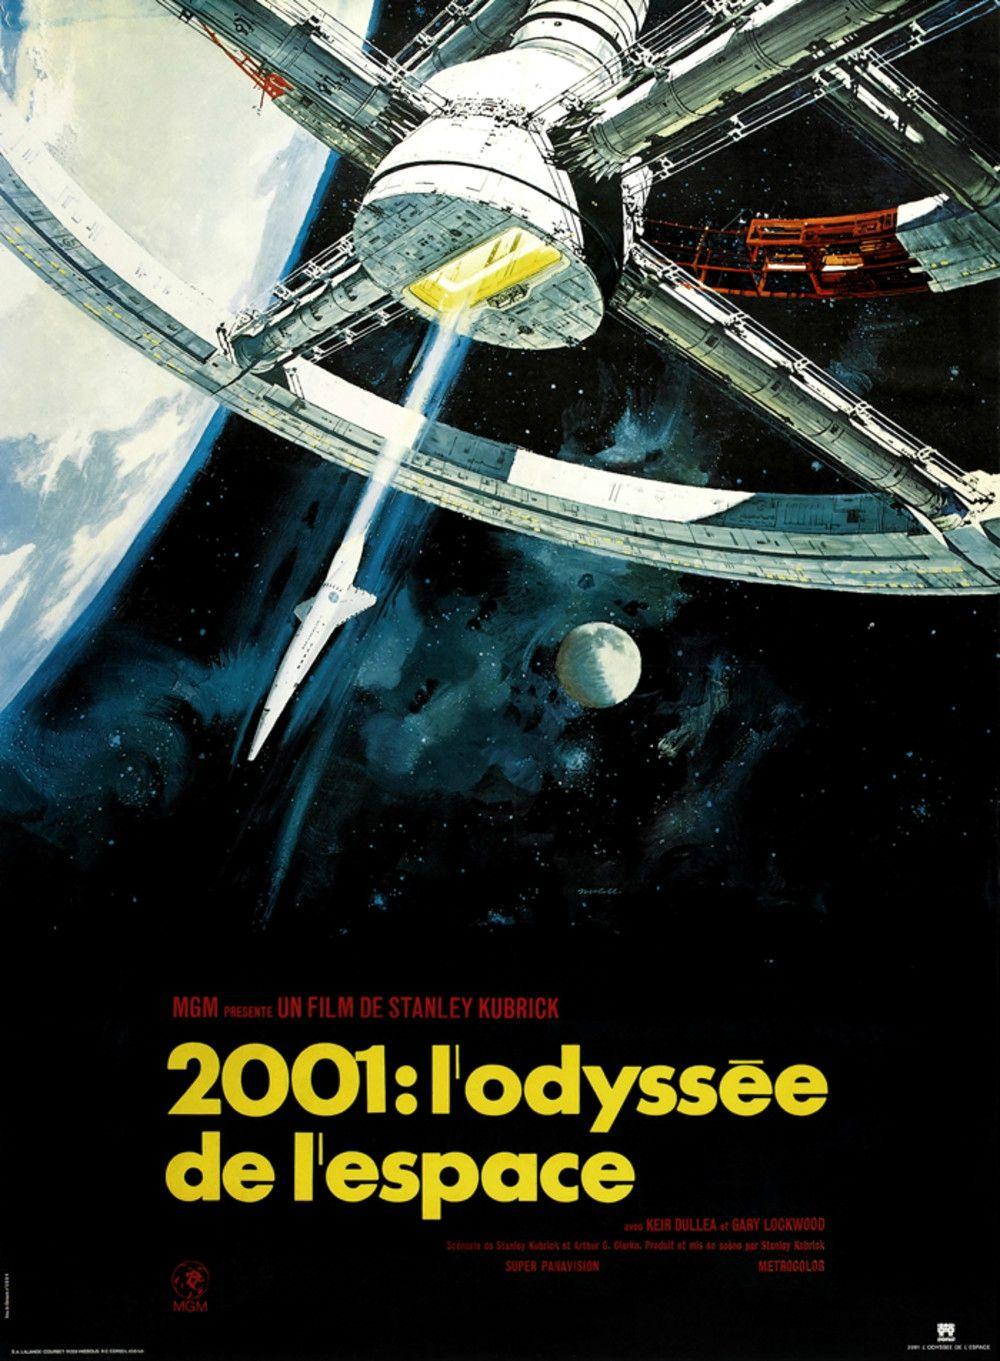 2001 l odyssee de l espace